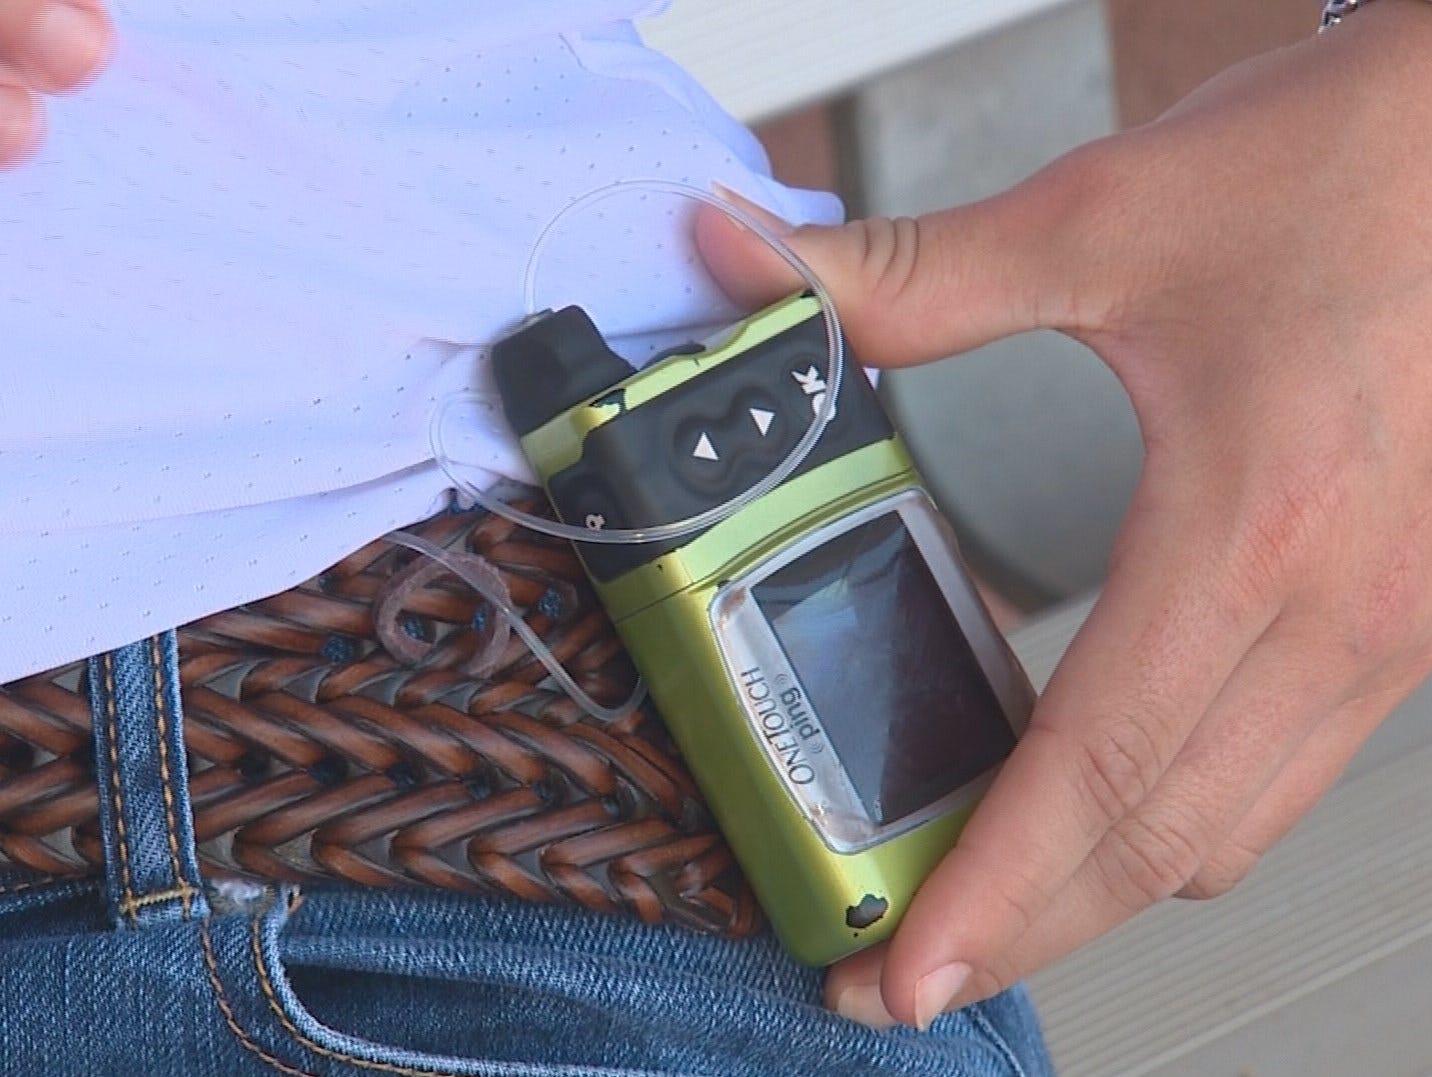 Hallie Corssnoe's insulin pump